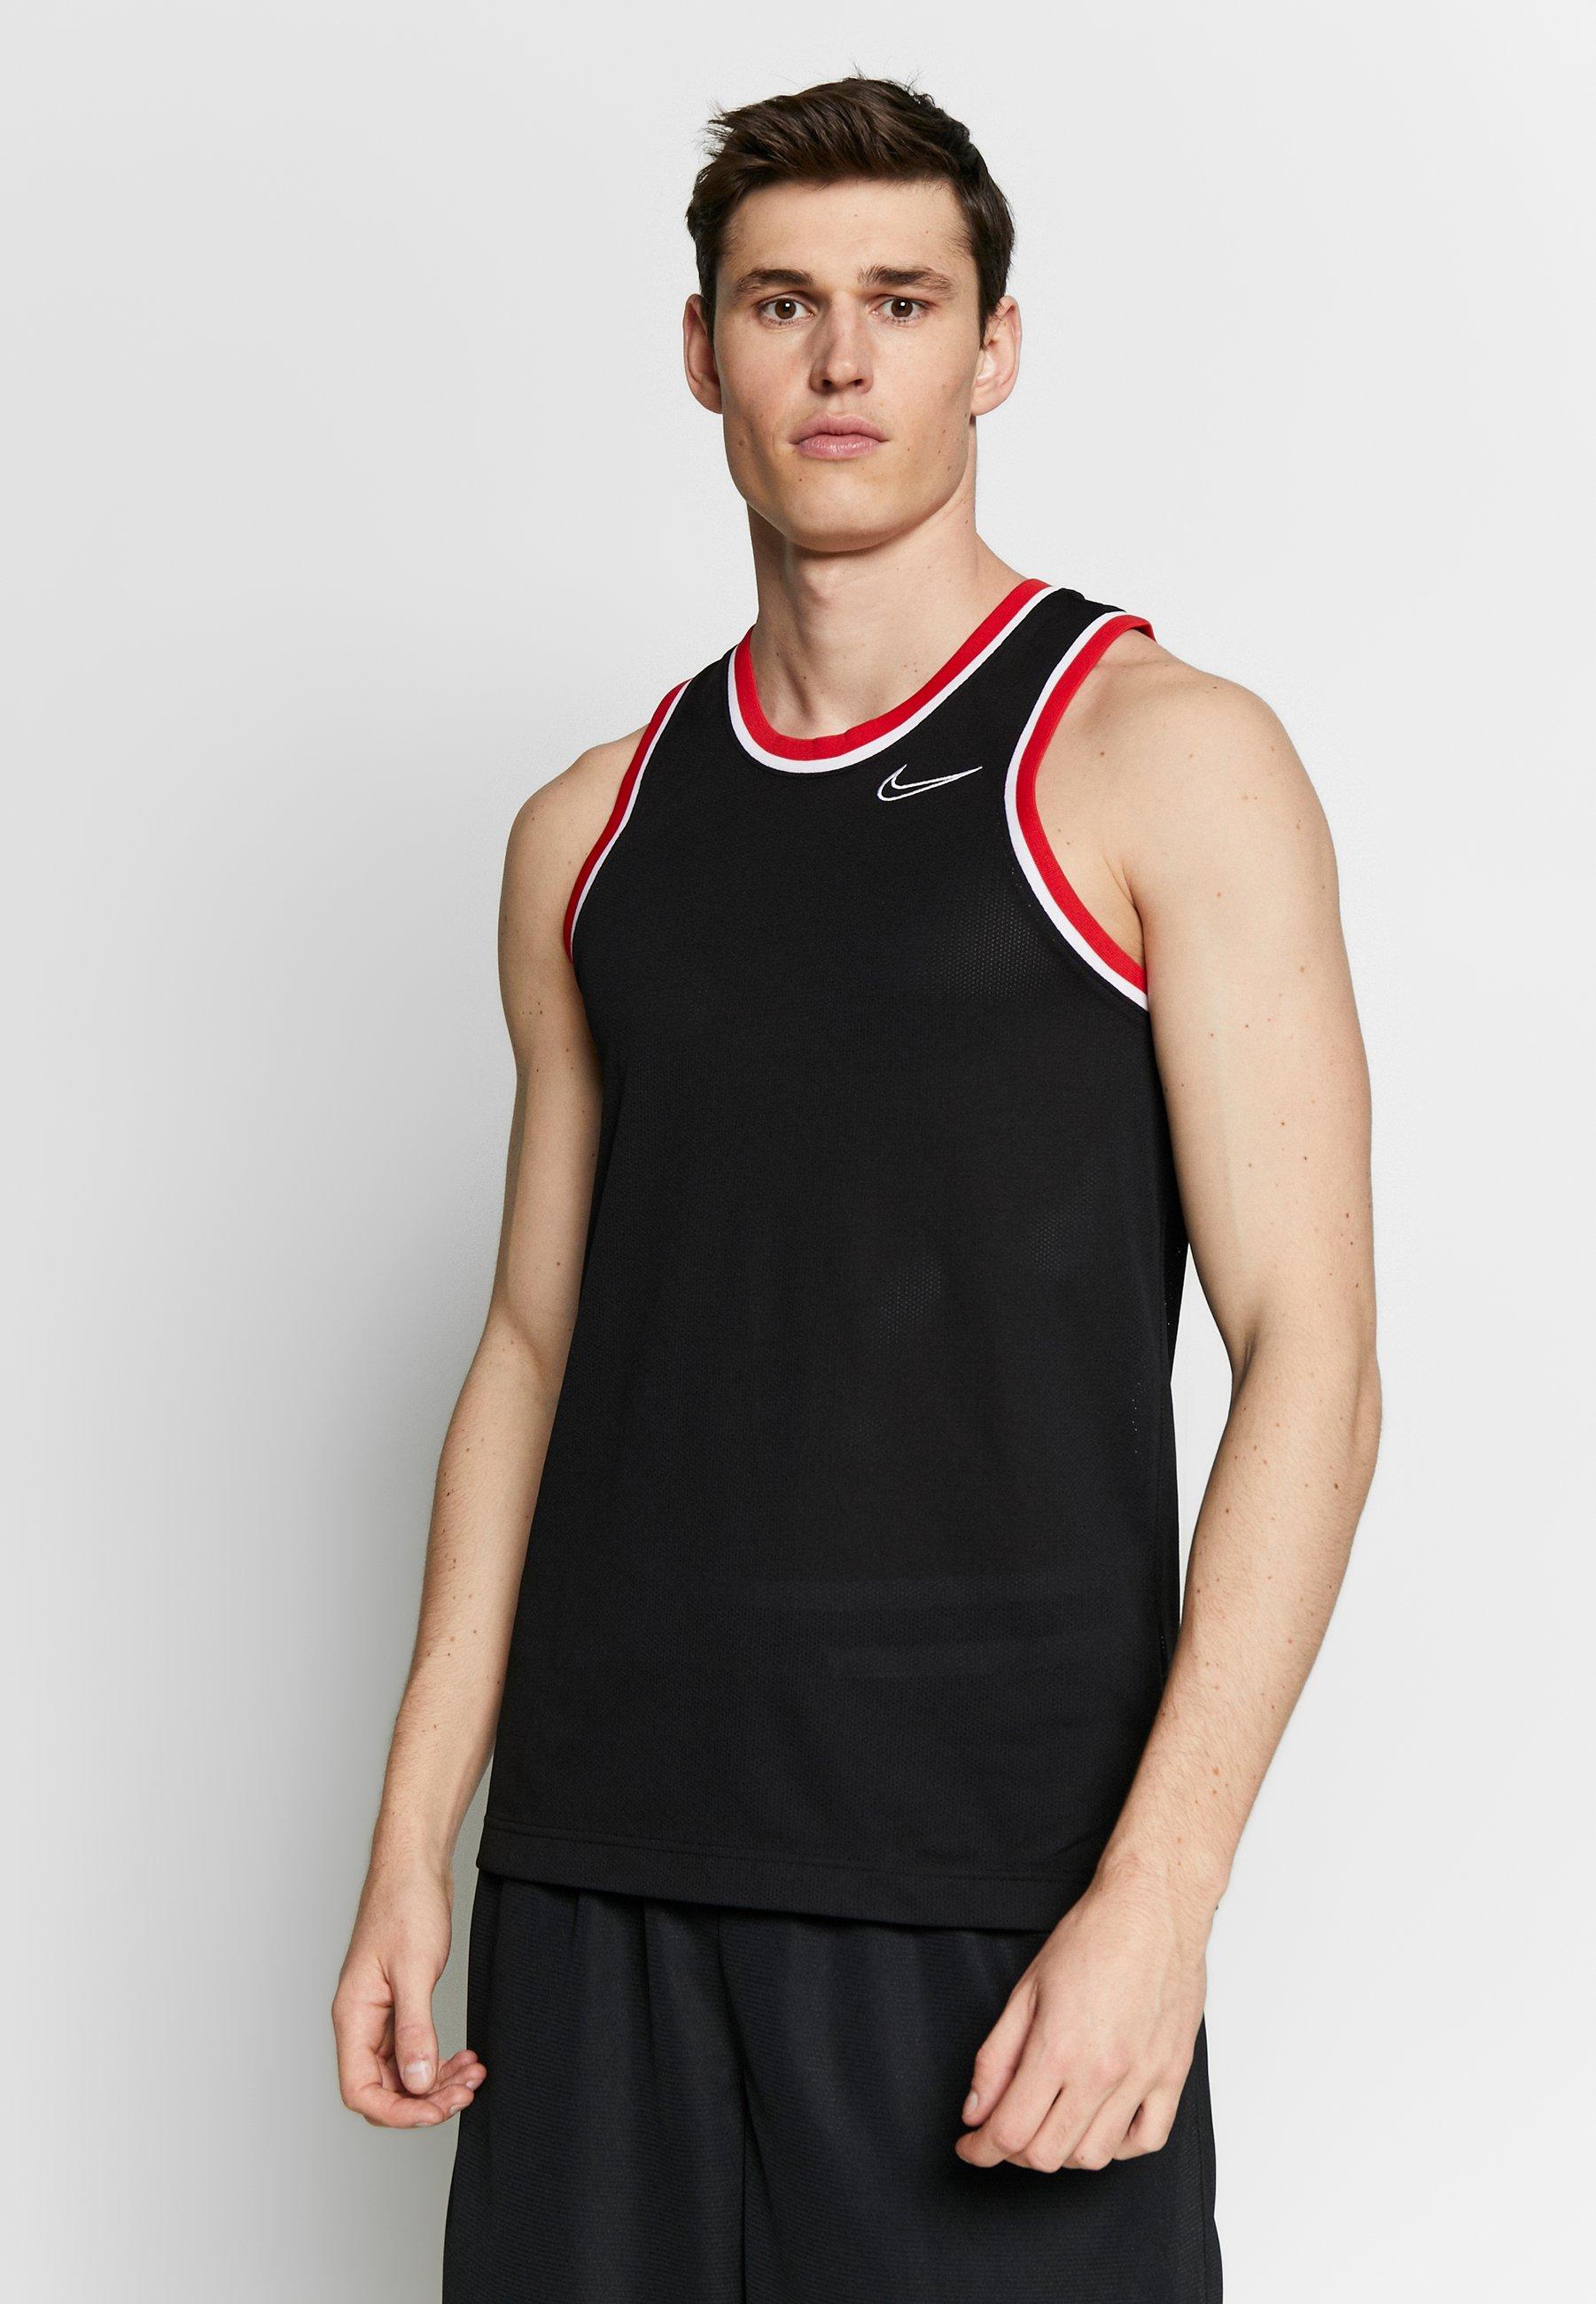 Nike Sporttops heren online kopen | ZALANDO